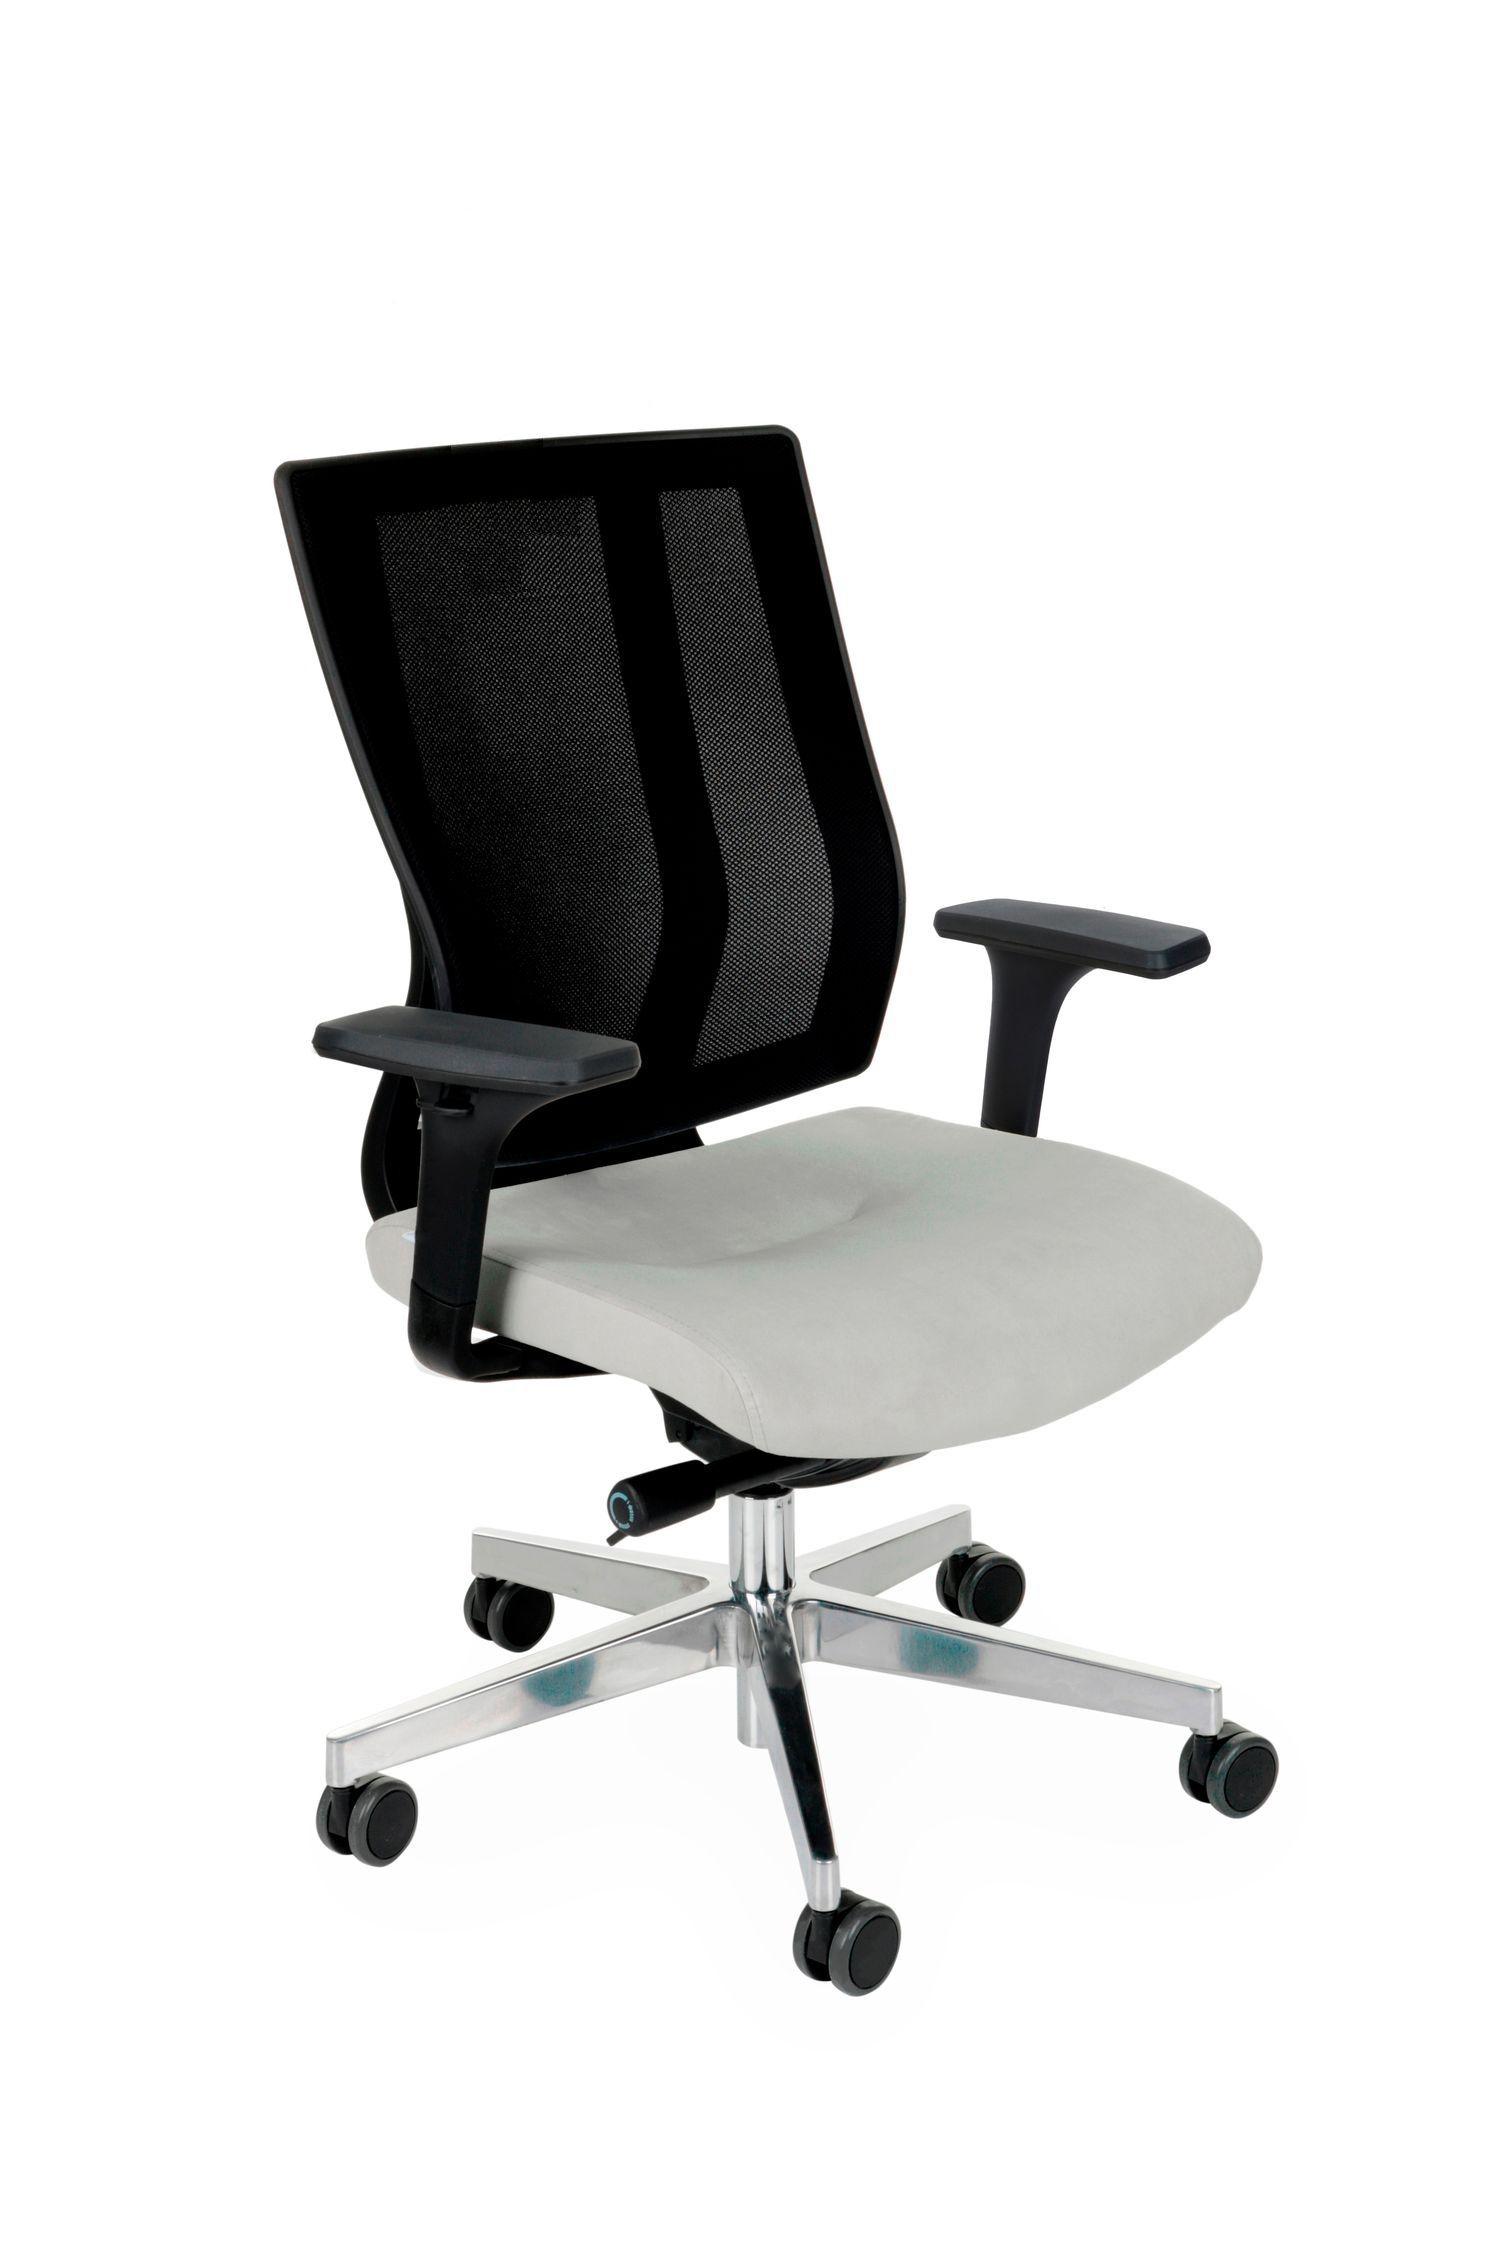 Fotel Biurowy obrotowy MAXPRO BS - różne tapicerki